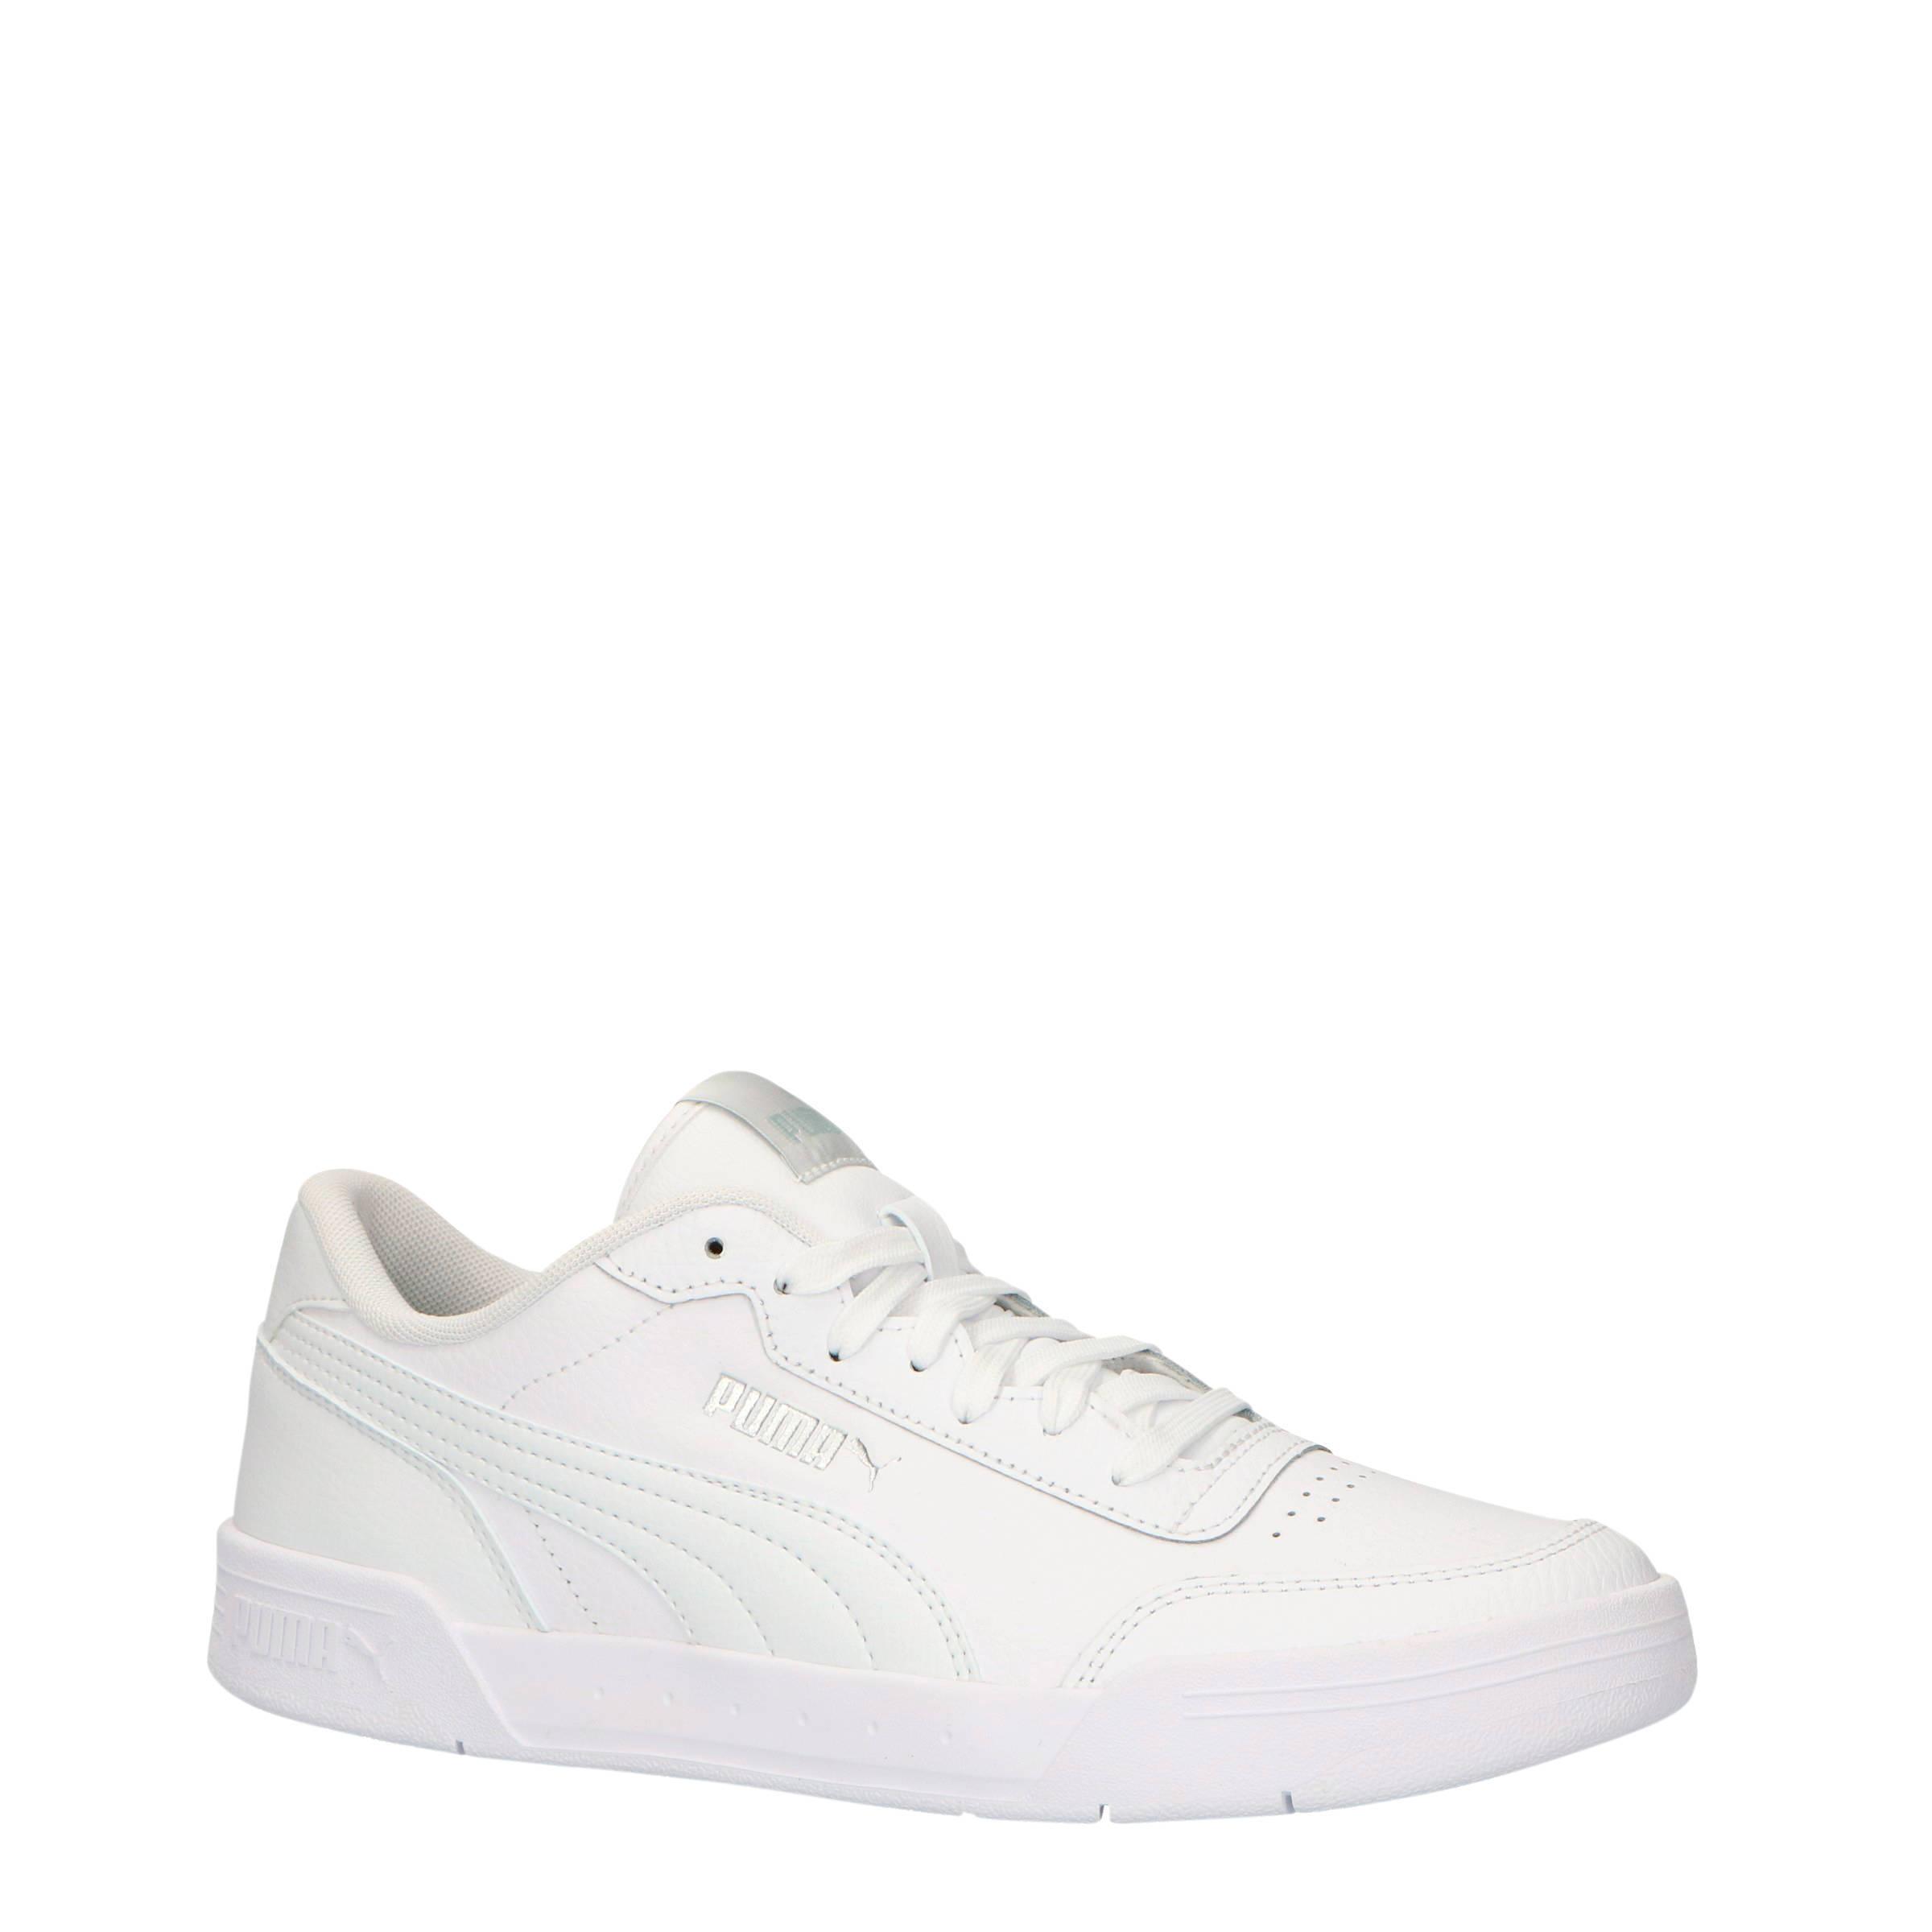 Puma Caracal sneakers wit | wehkamp